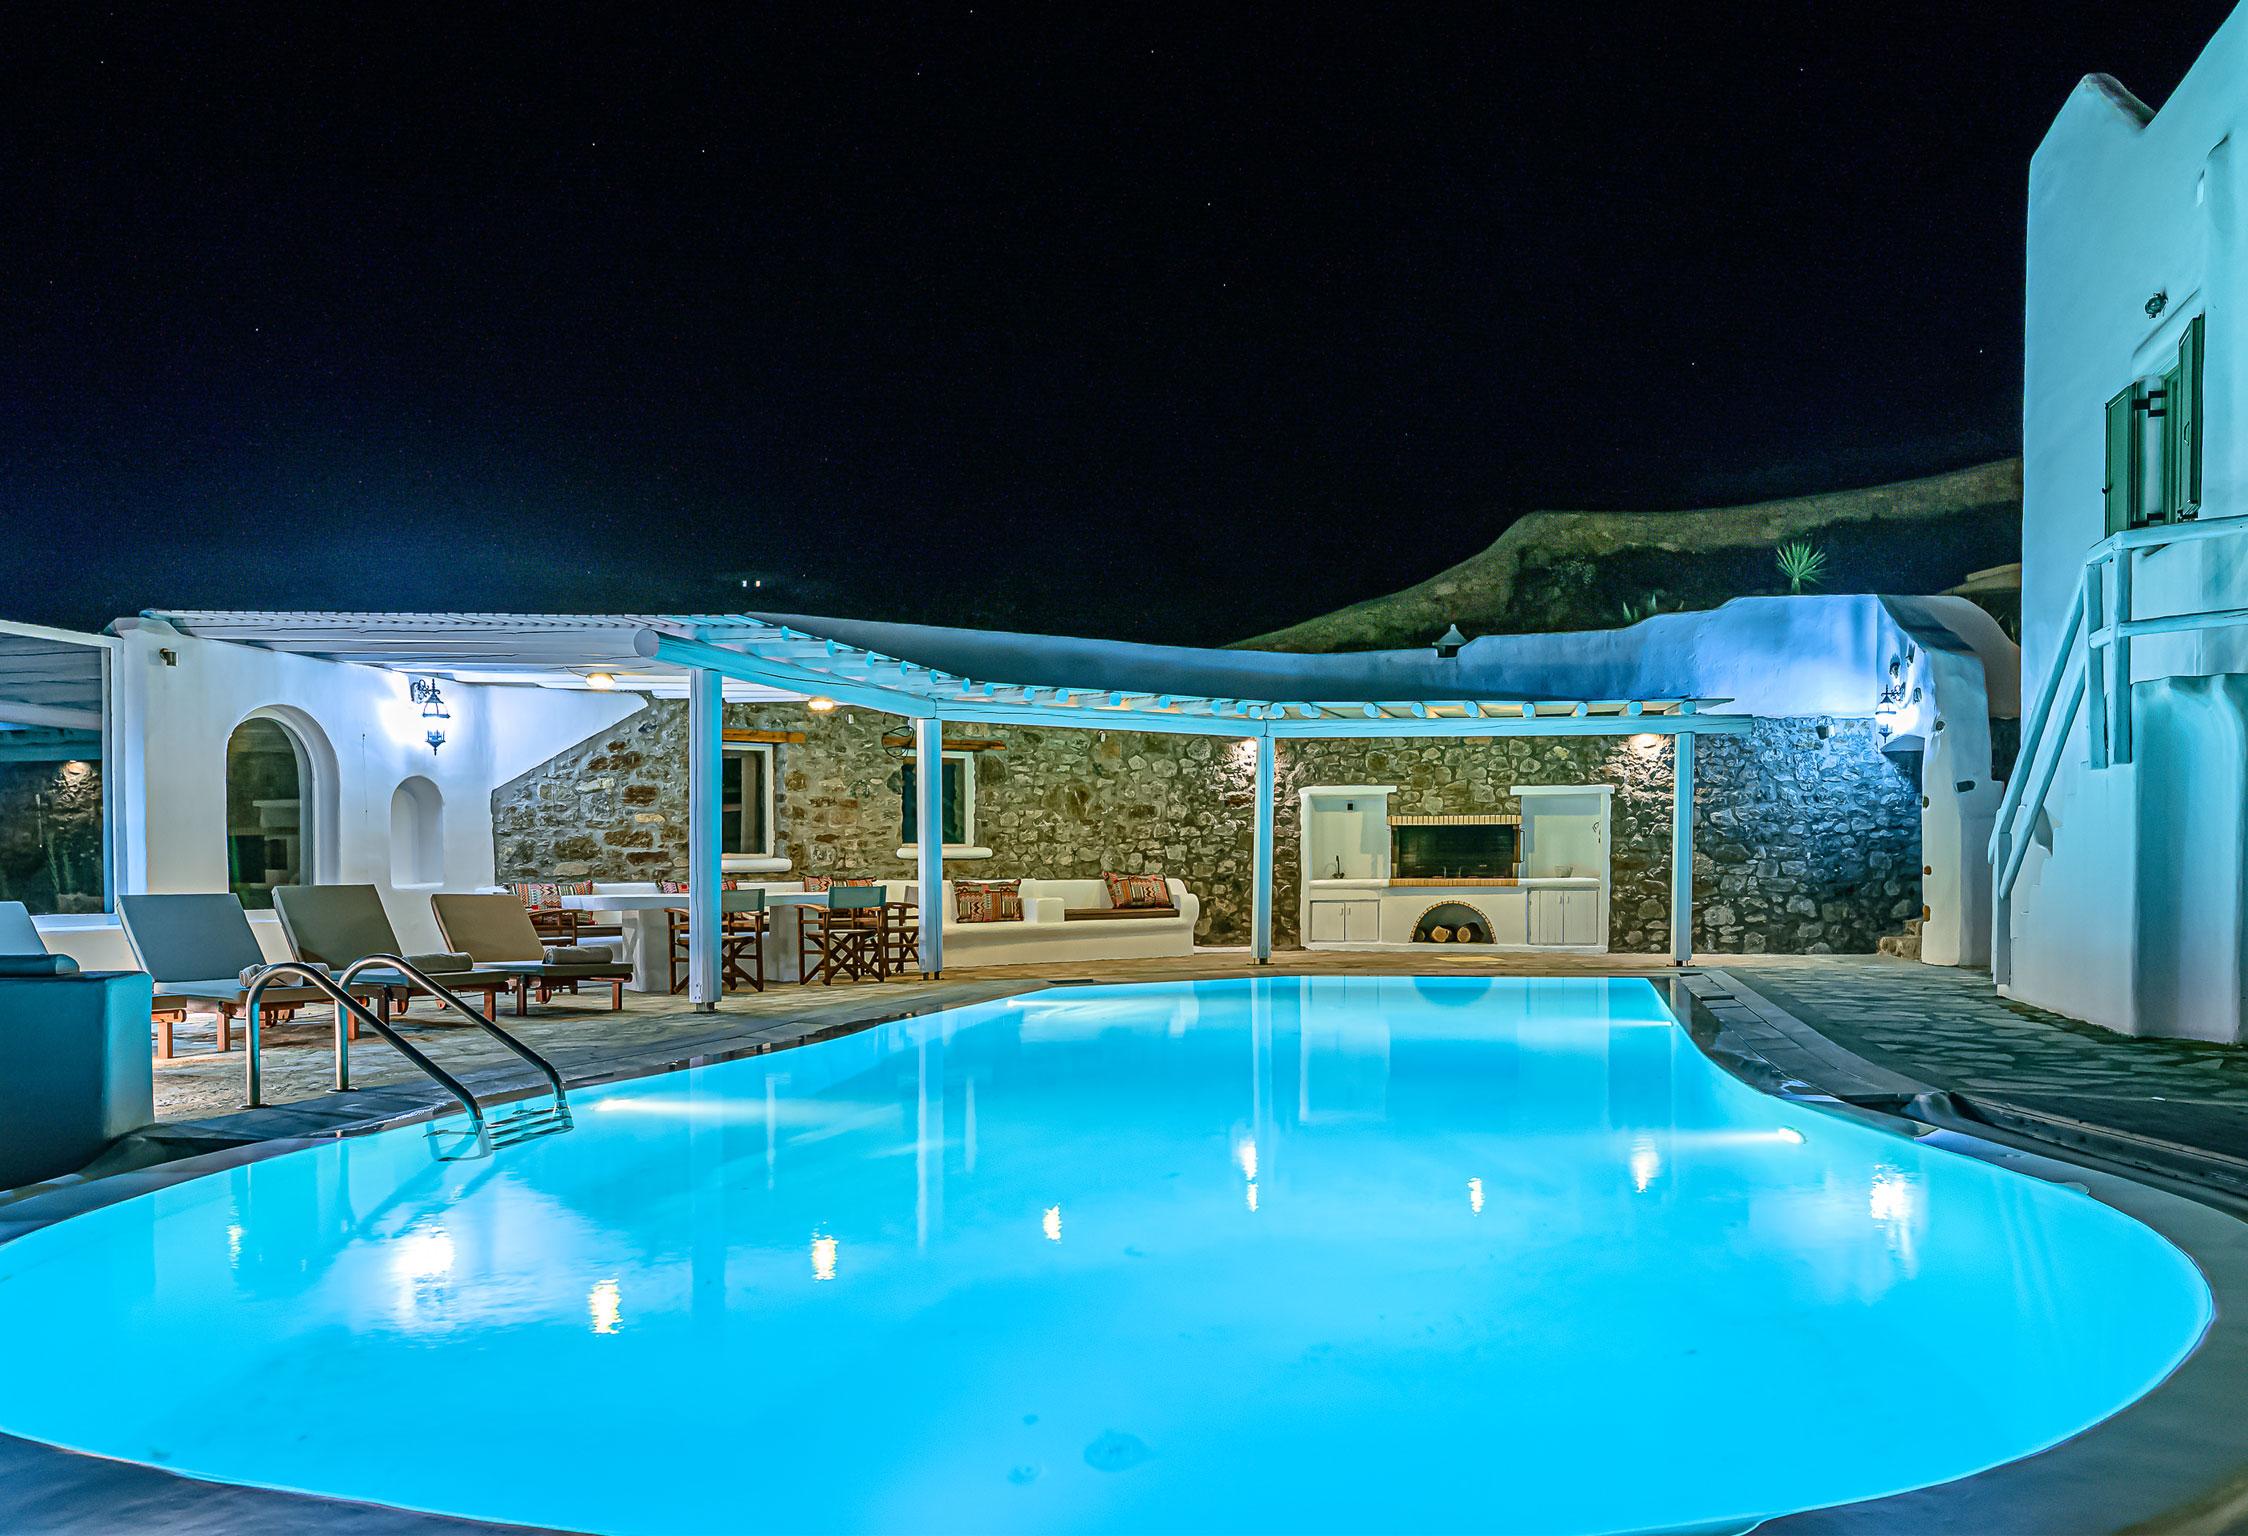 Mykonos Villa Alexandros 3 jumbotron image